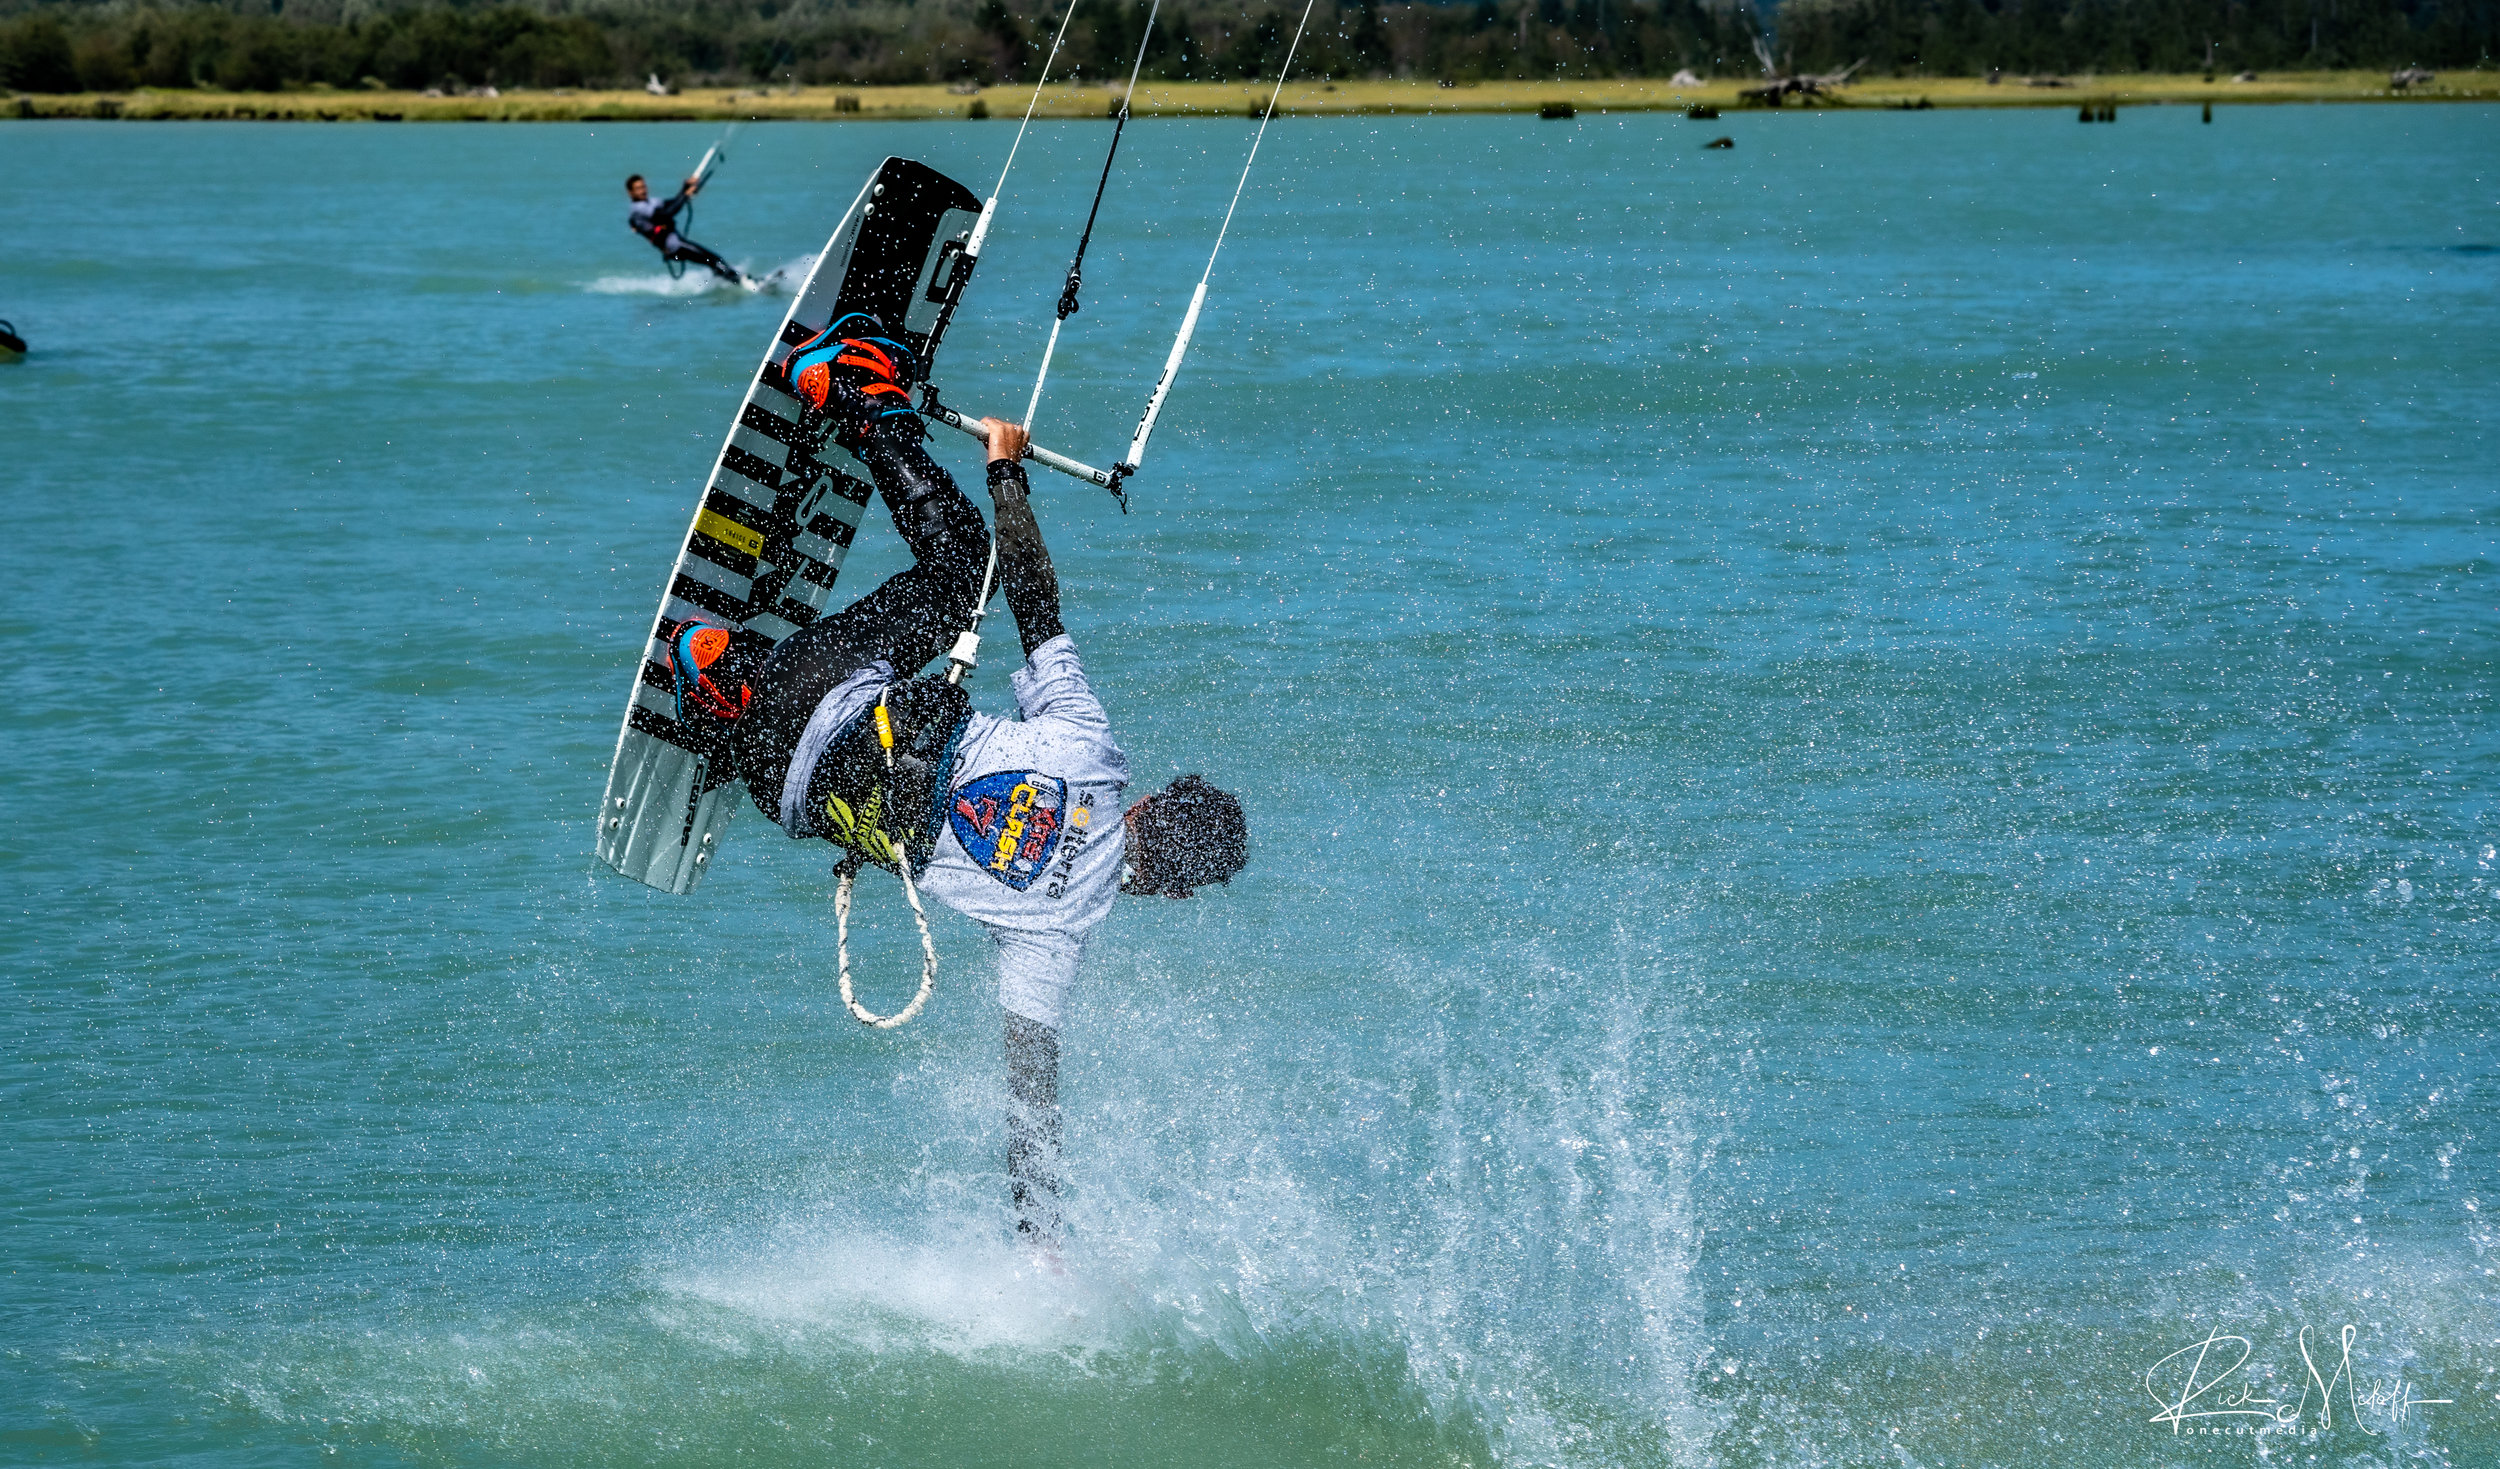 kite-clash-rider-rick-meloff